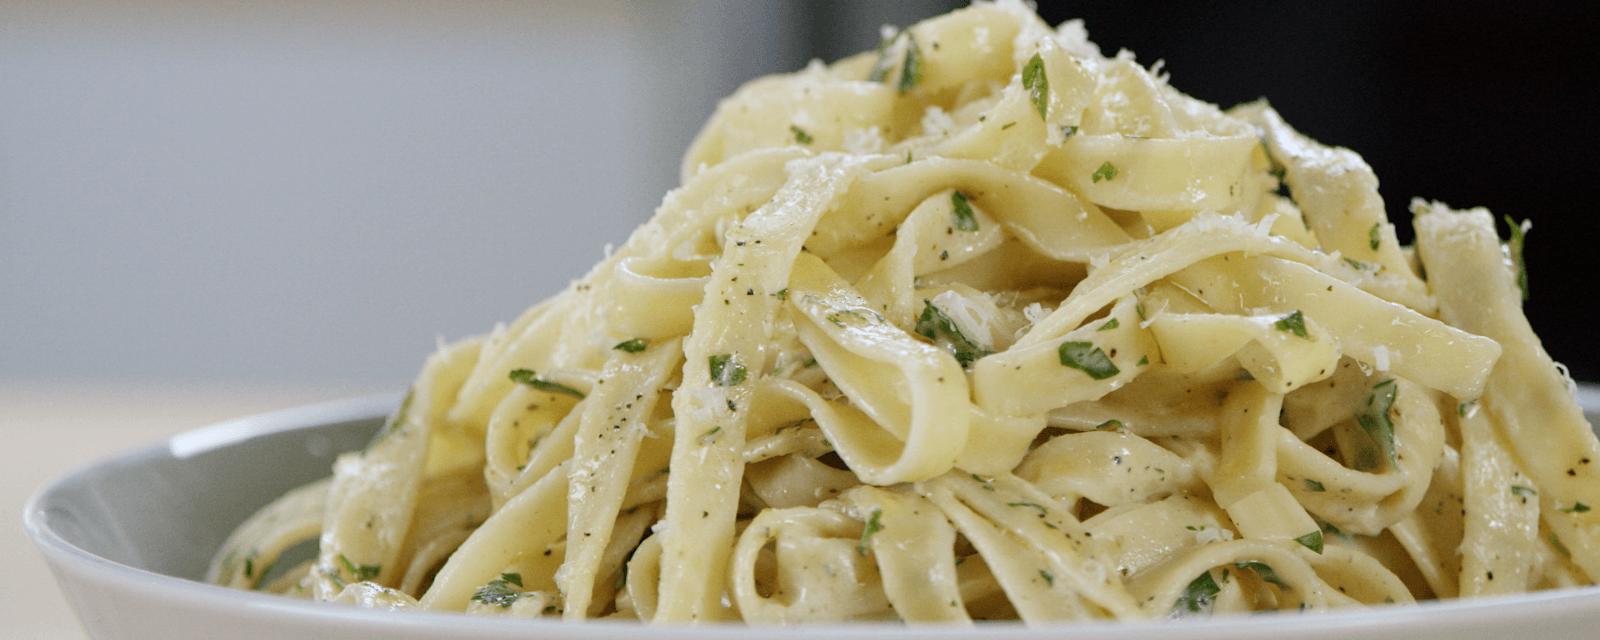 Creamy pasta